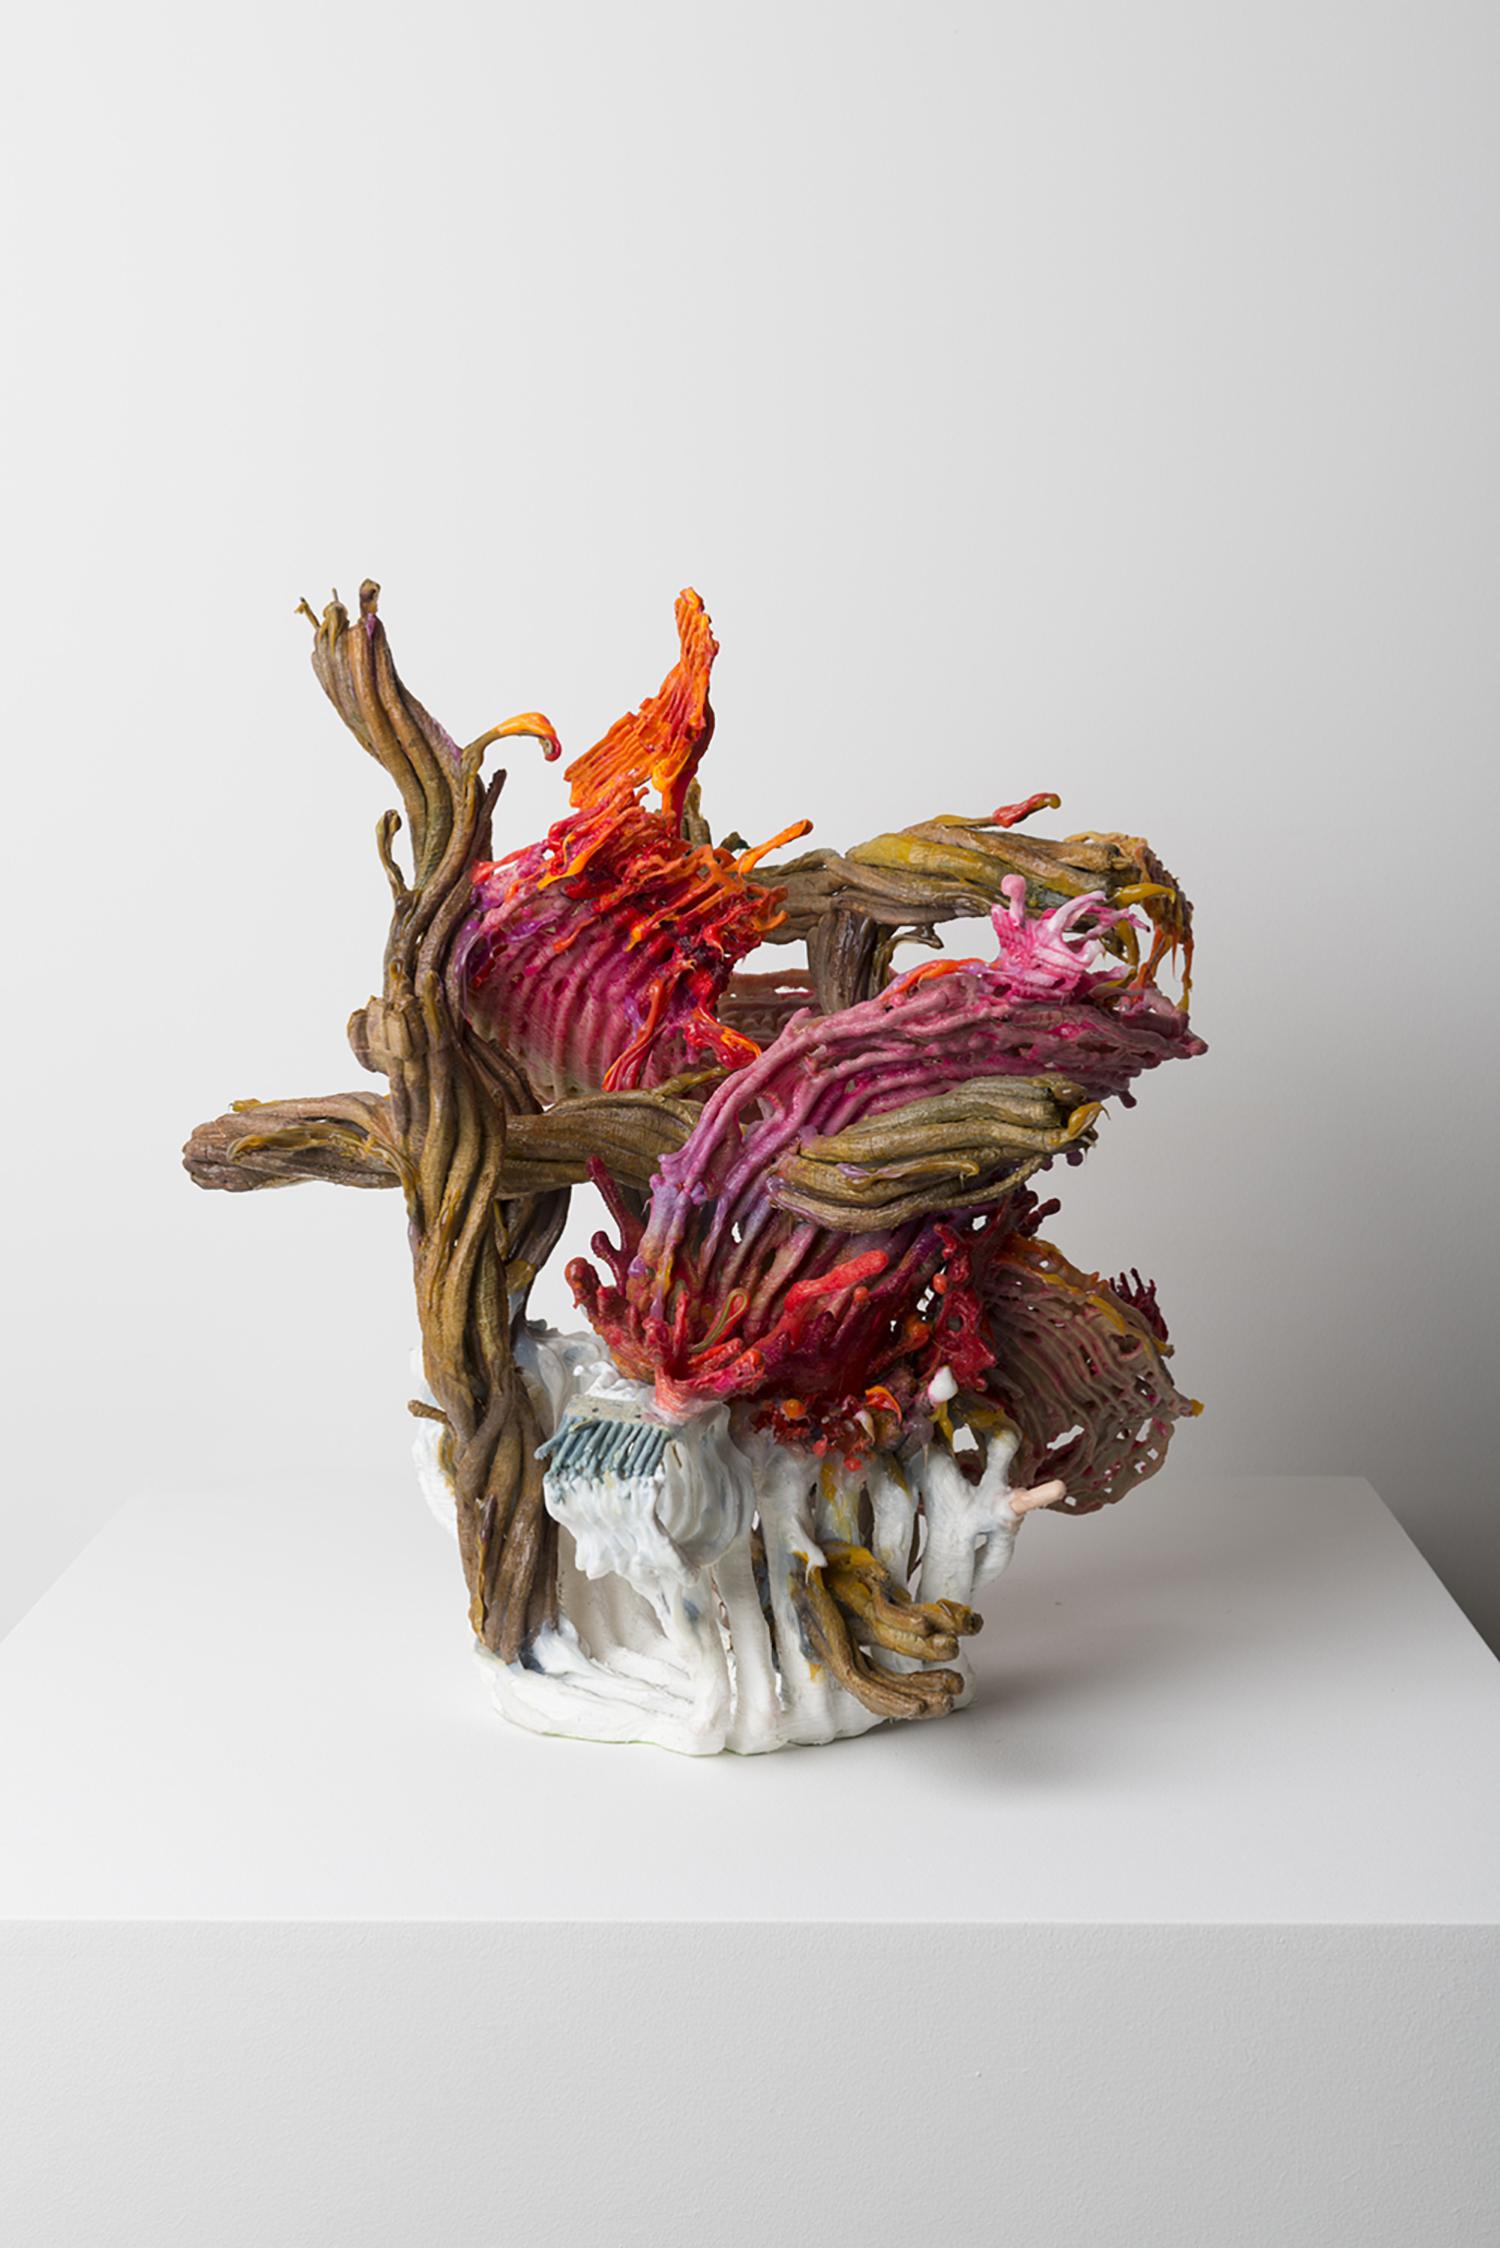 Loop Plastema, 2016, (detail)  40 x 30 x 30 cm | 15 3/4 x 11 3/4 x 11 3/4 in  3D printed plastic, alkyd paint, silicone